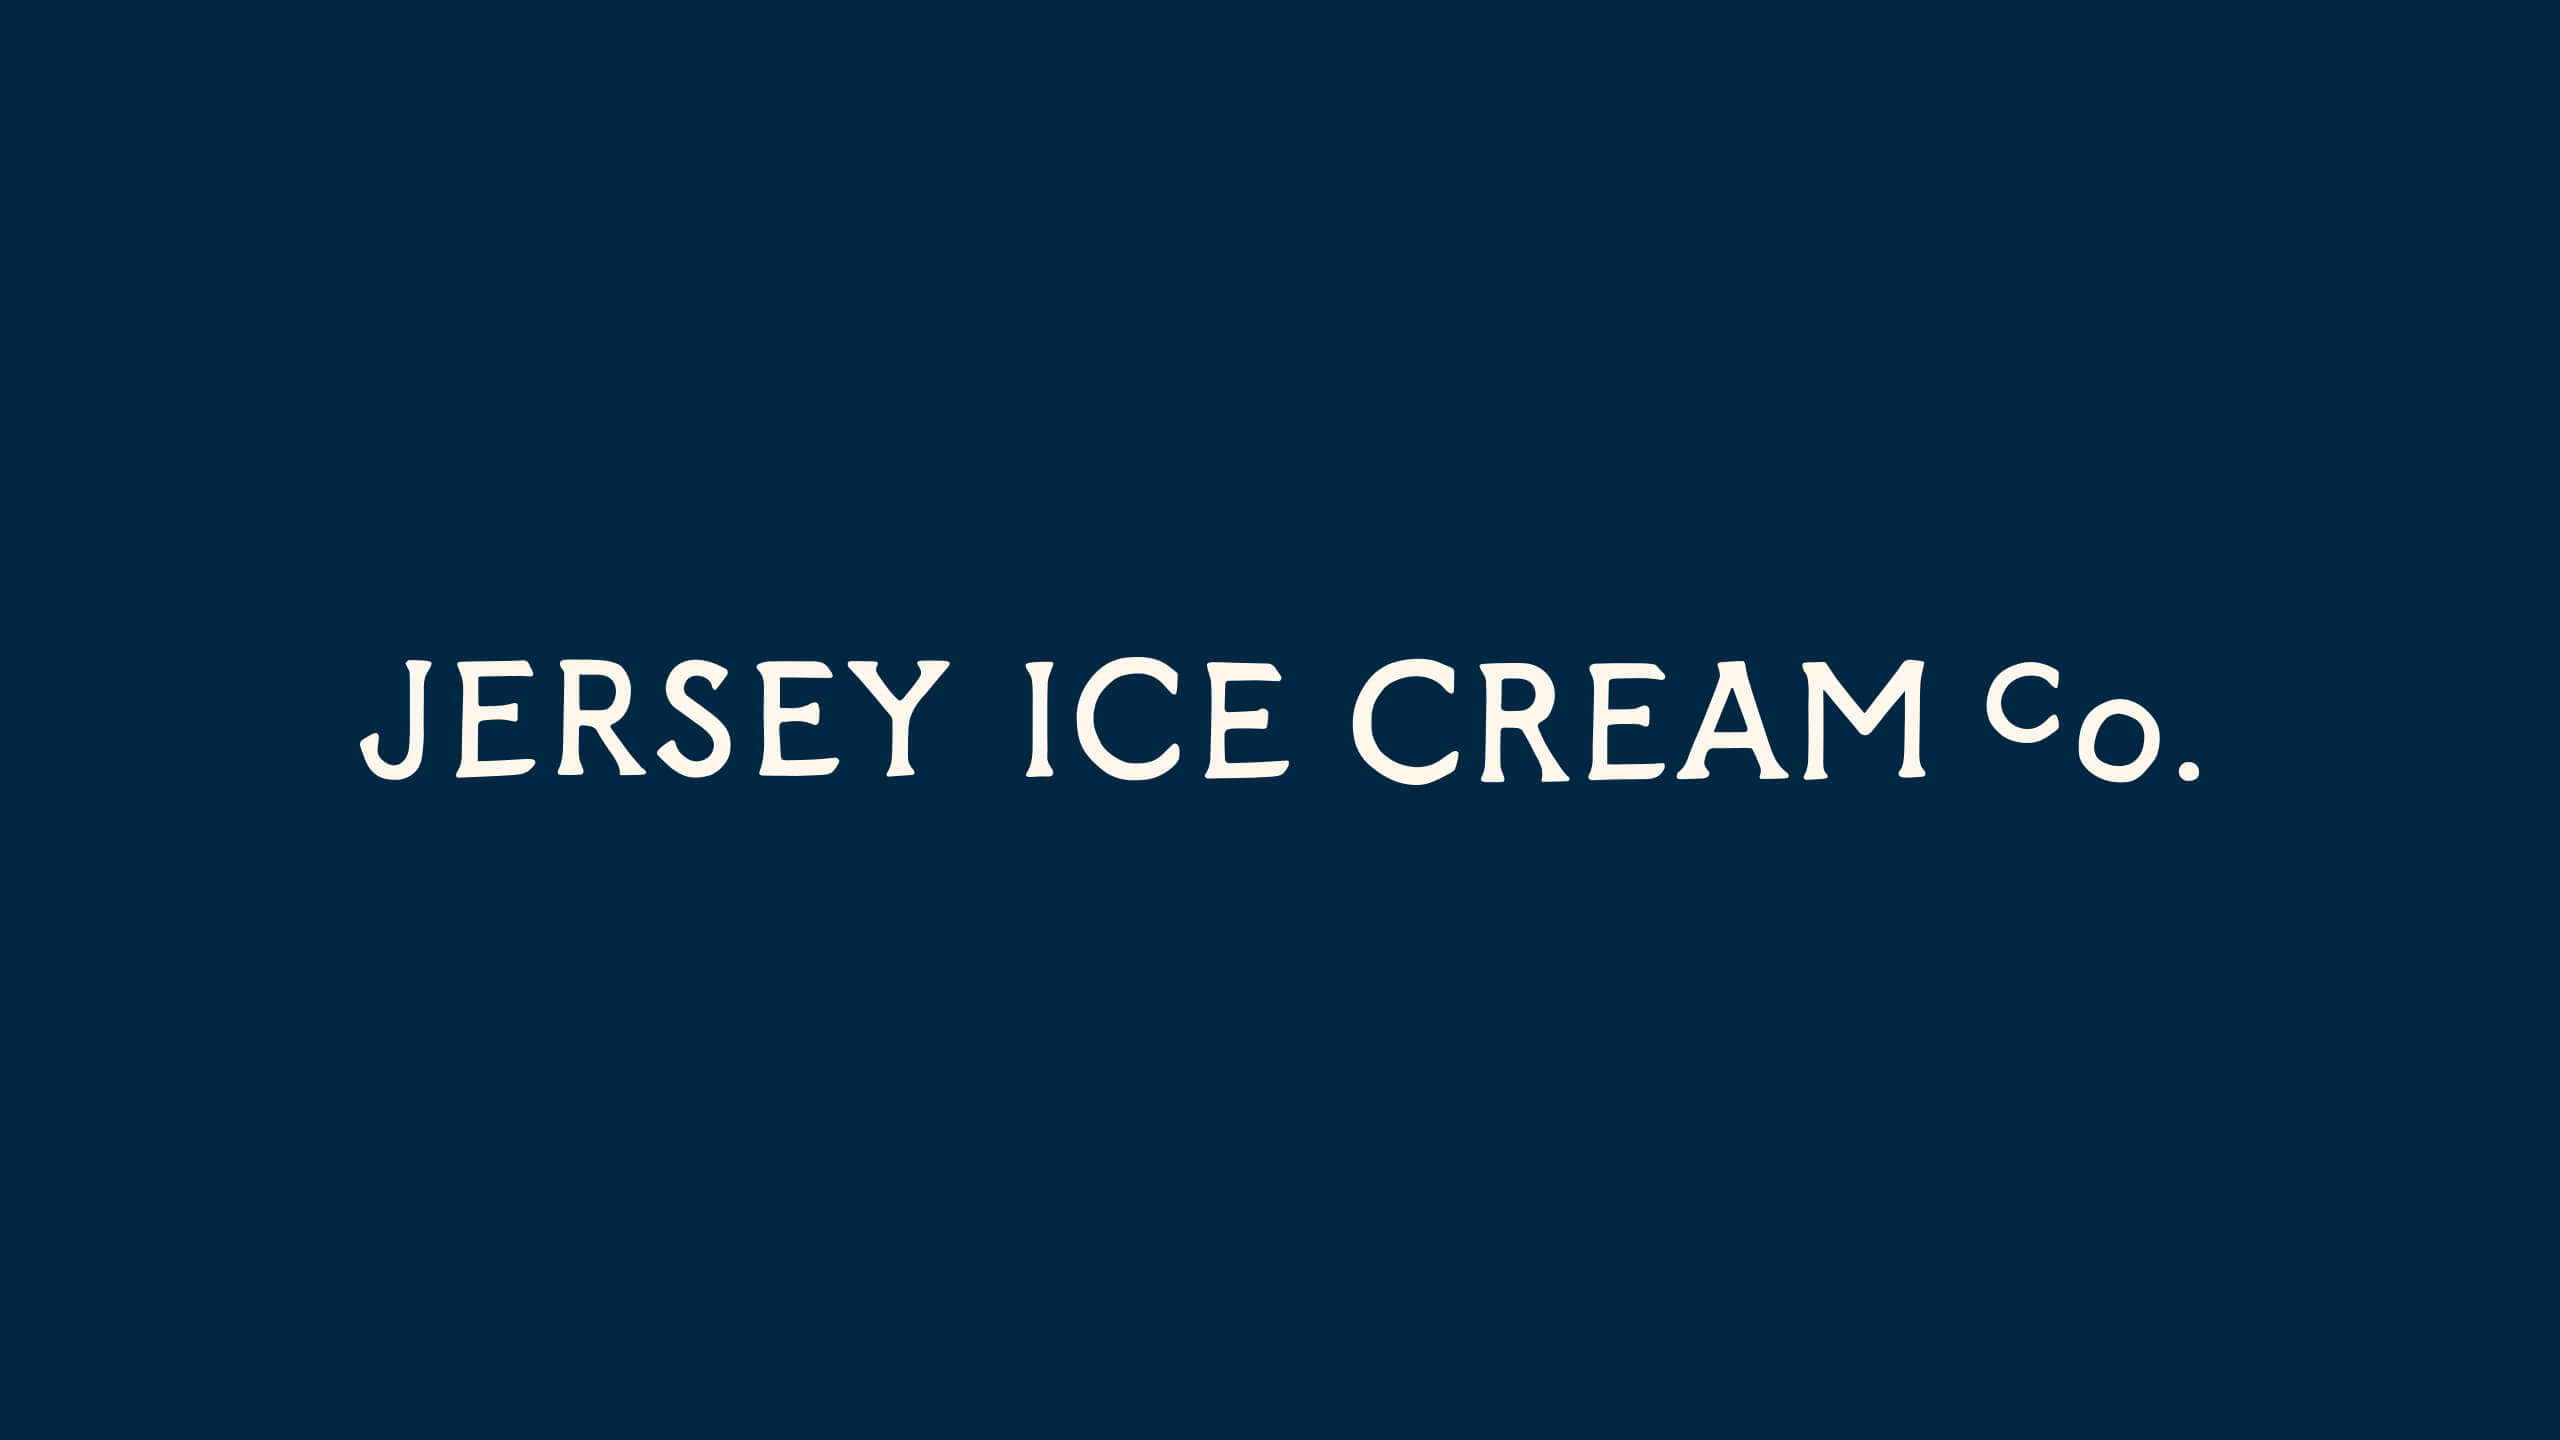 bueno-work-jersey-ice-cream-co-logotype